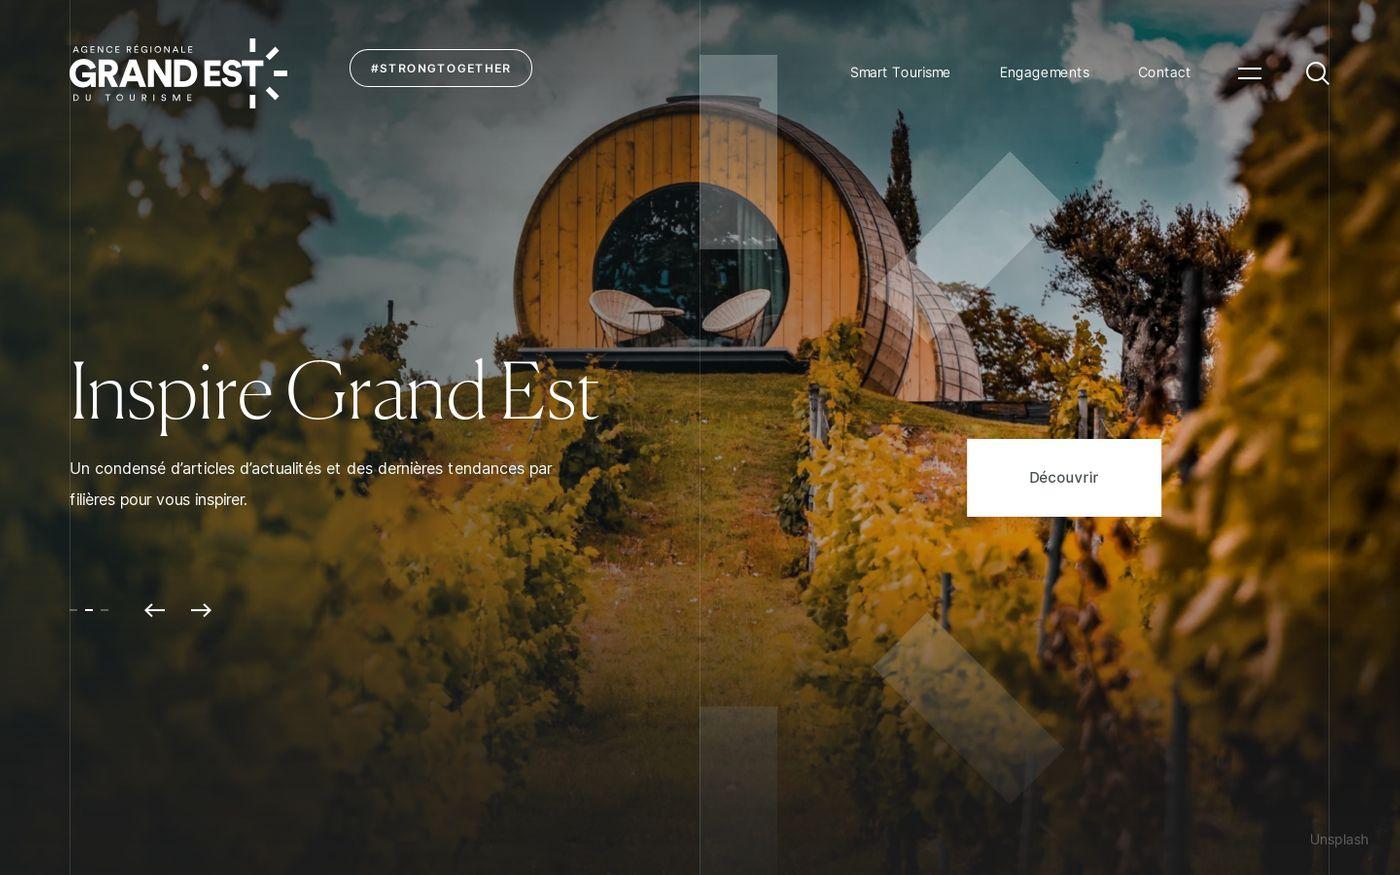 Screenshot of Agence régionale du tourisme Grand Est website